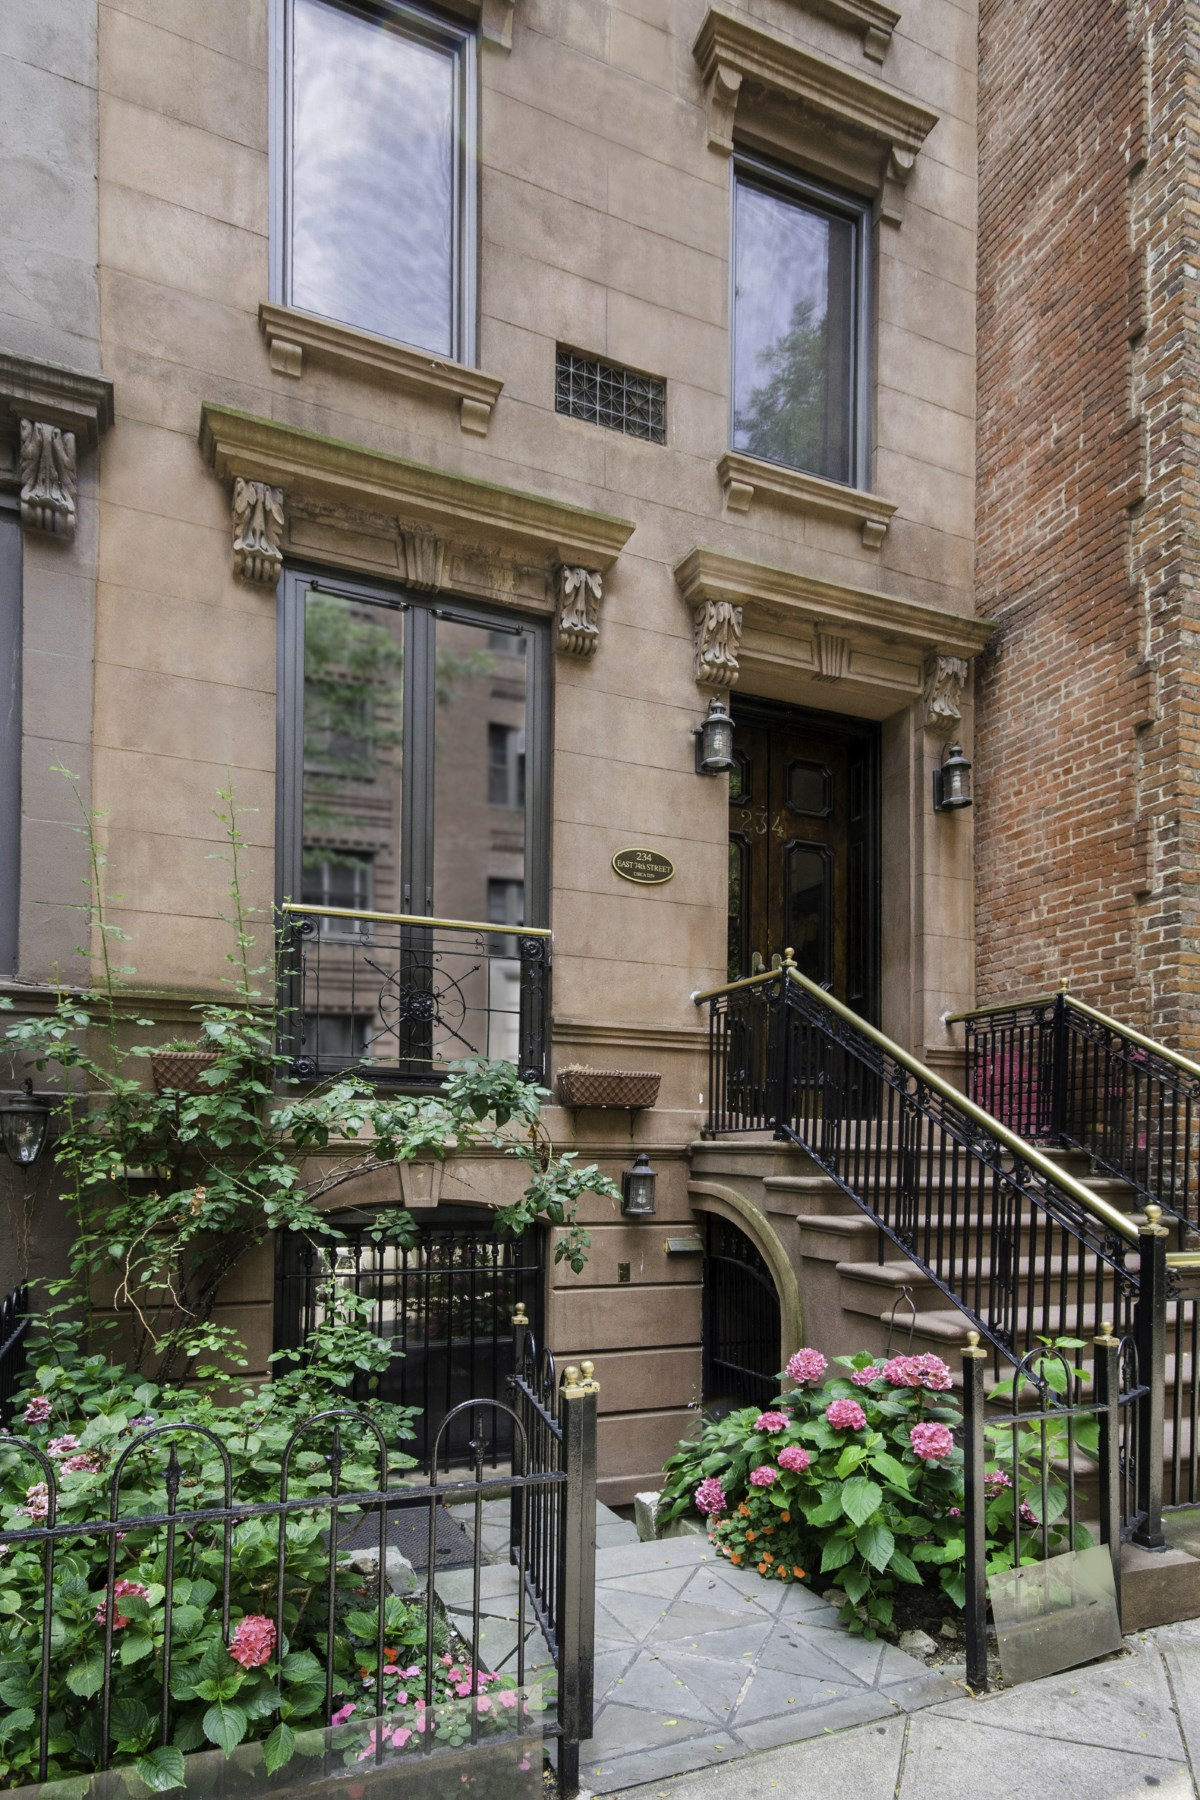 Nhà phố vì Bán tại Lenox Hill Townhouse with Loft Appeal 234 East 74th Street Upper East Side, New York, New York, 10021 Hoa Kỳ